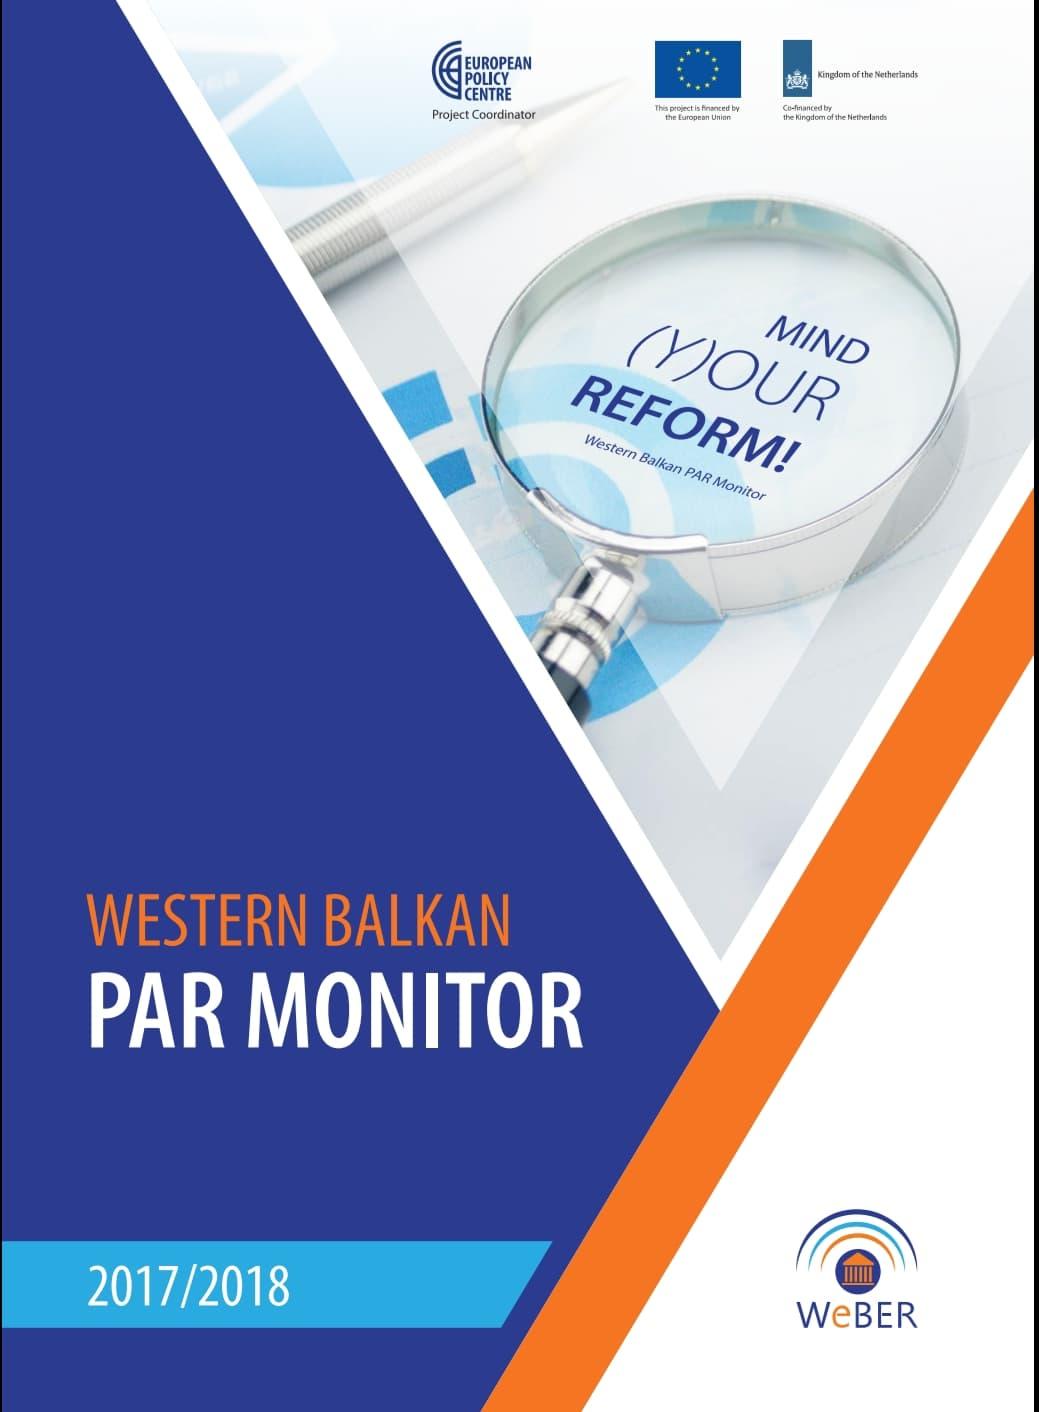 Western Balkan PAR Monitor 2017/2018